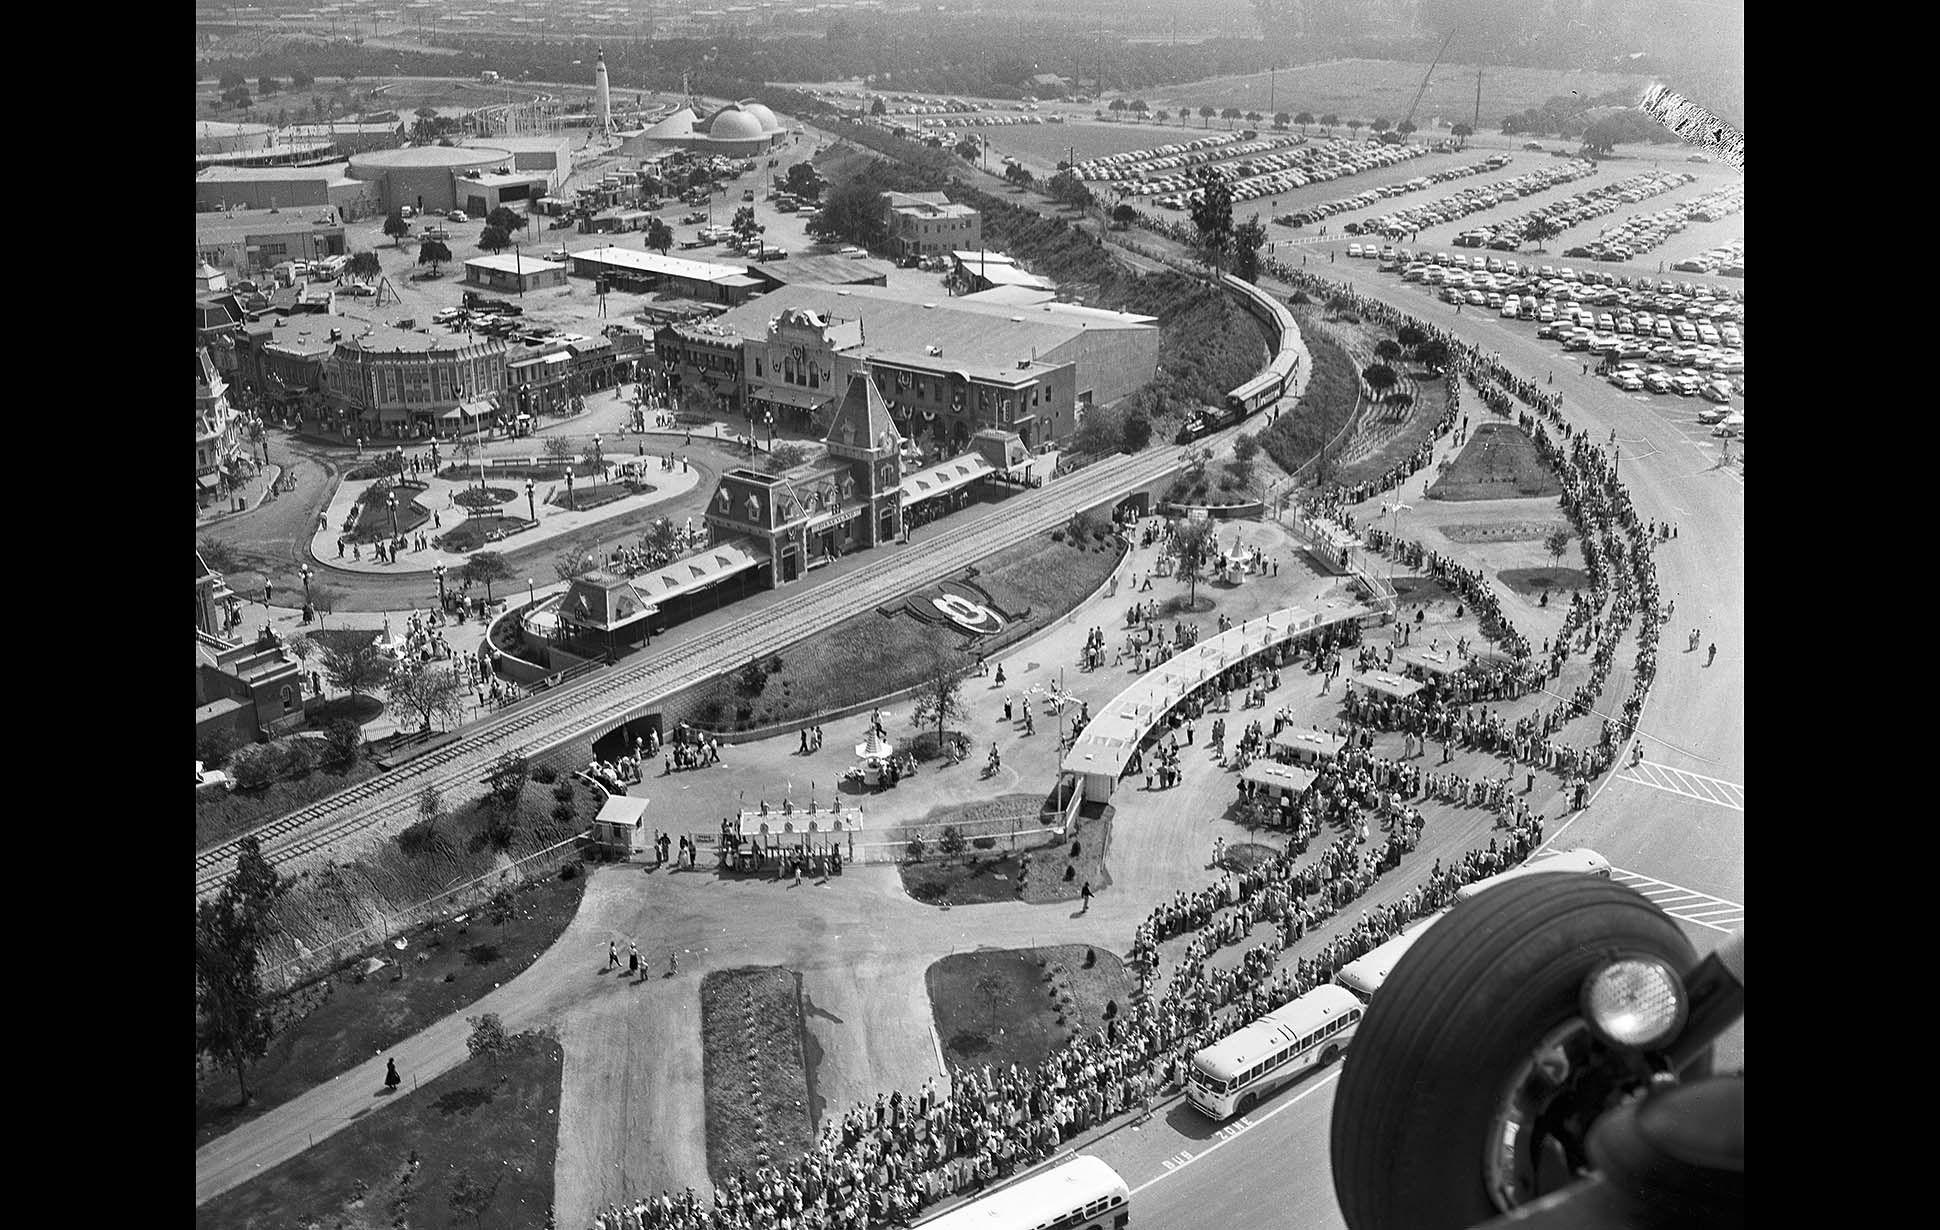 Disneyland S 1955 Opening Disney Rides Disneyland Opening Day Vintage Disneyland